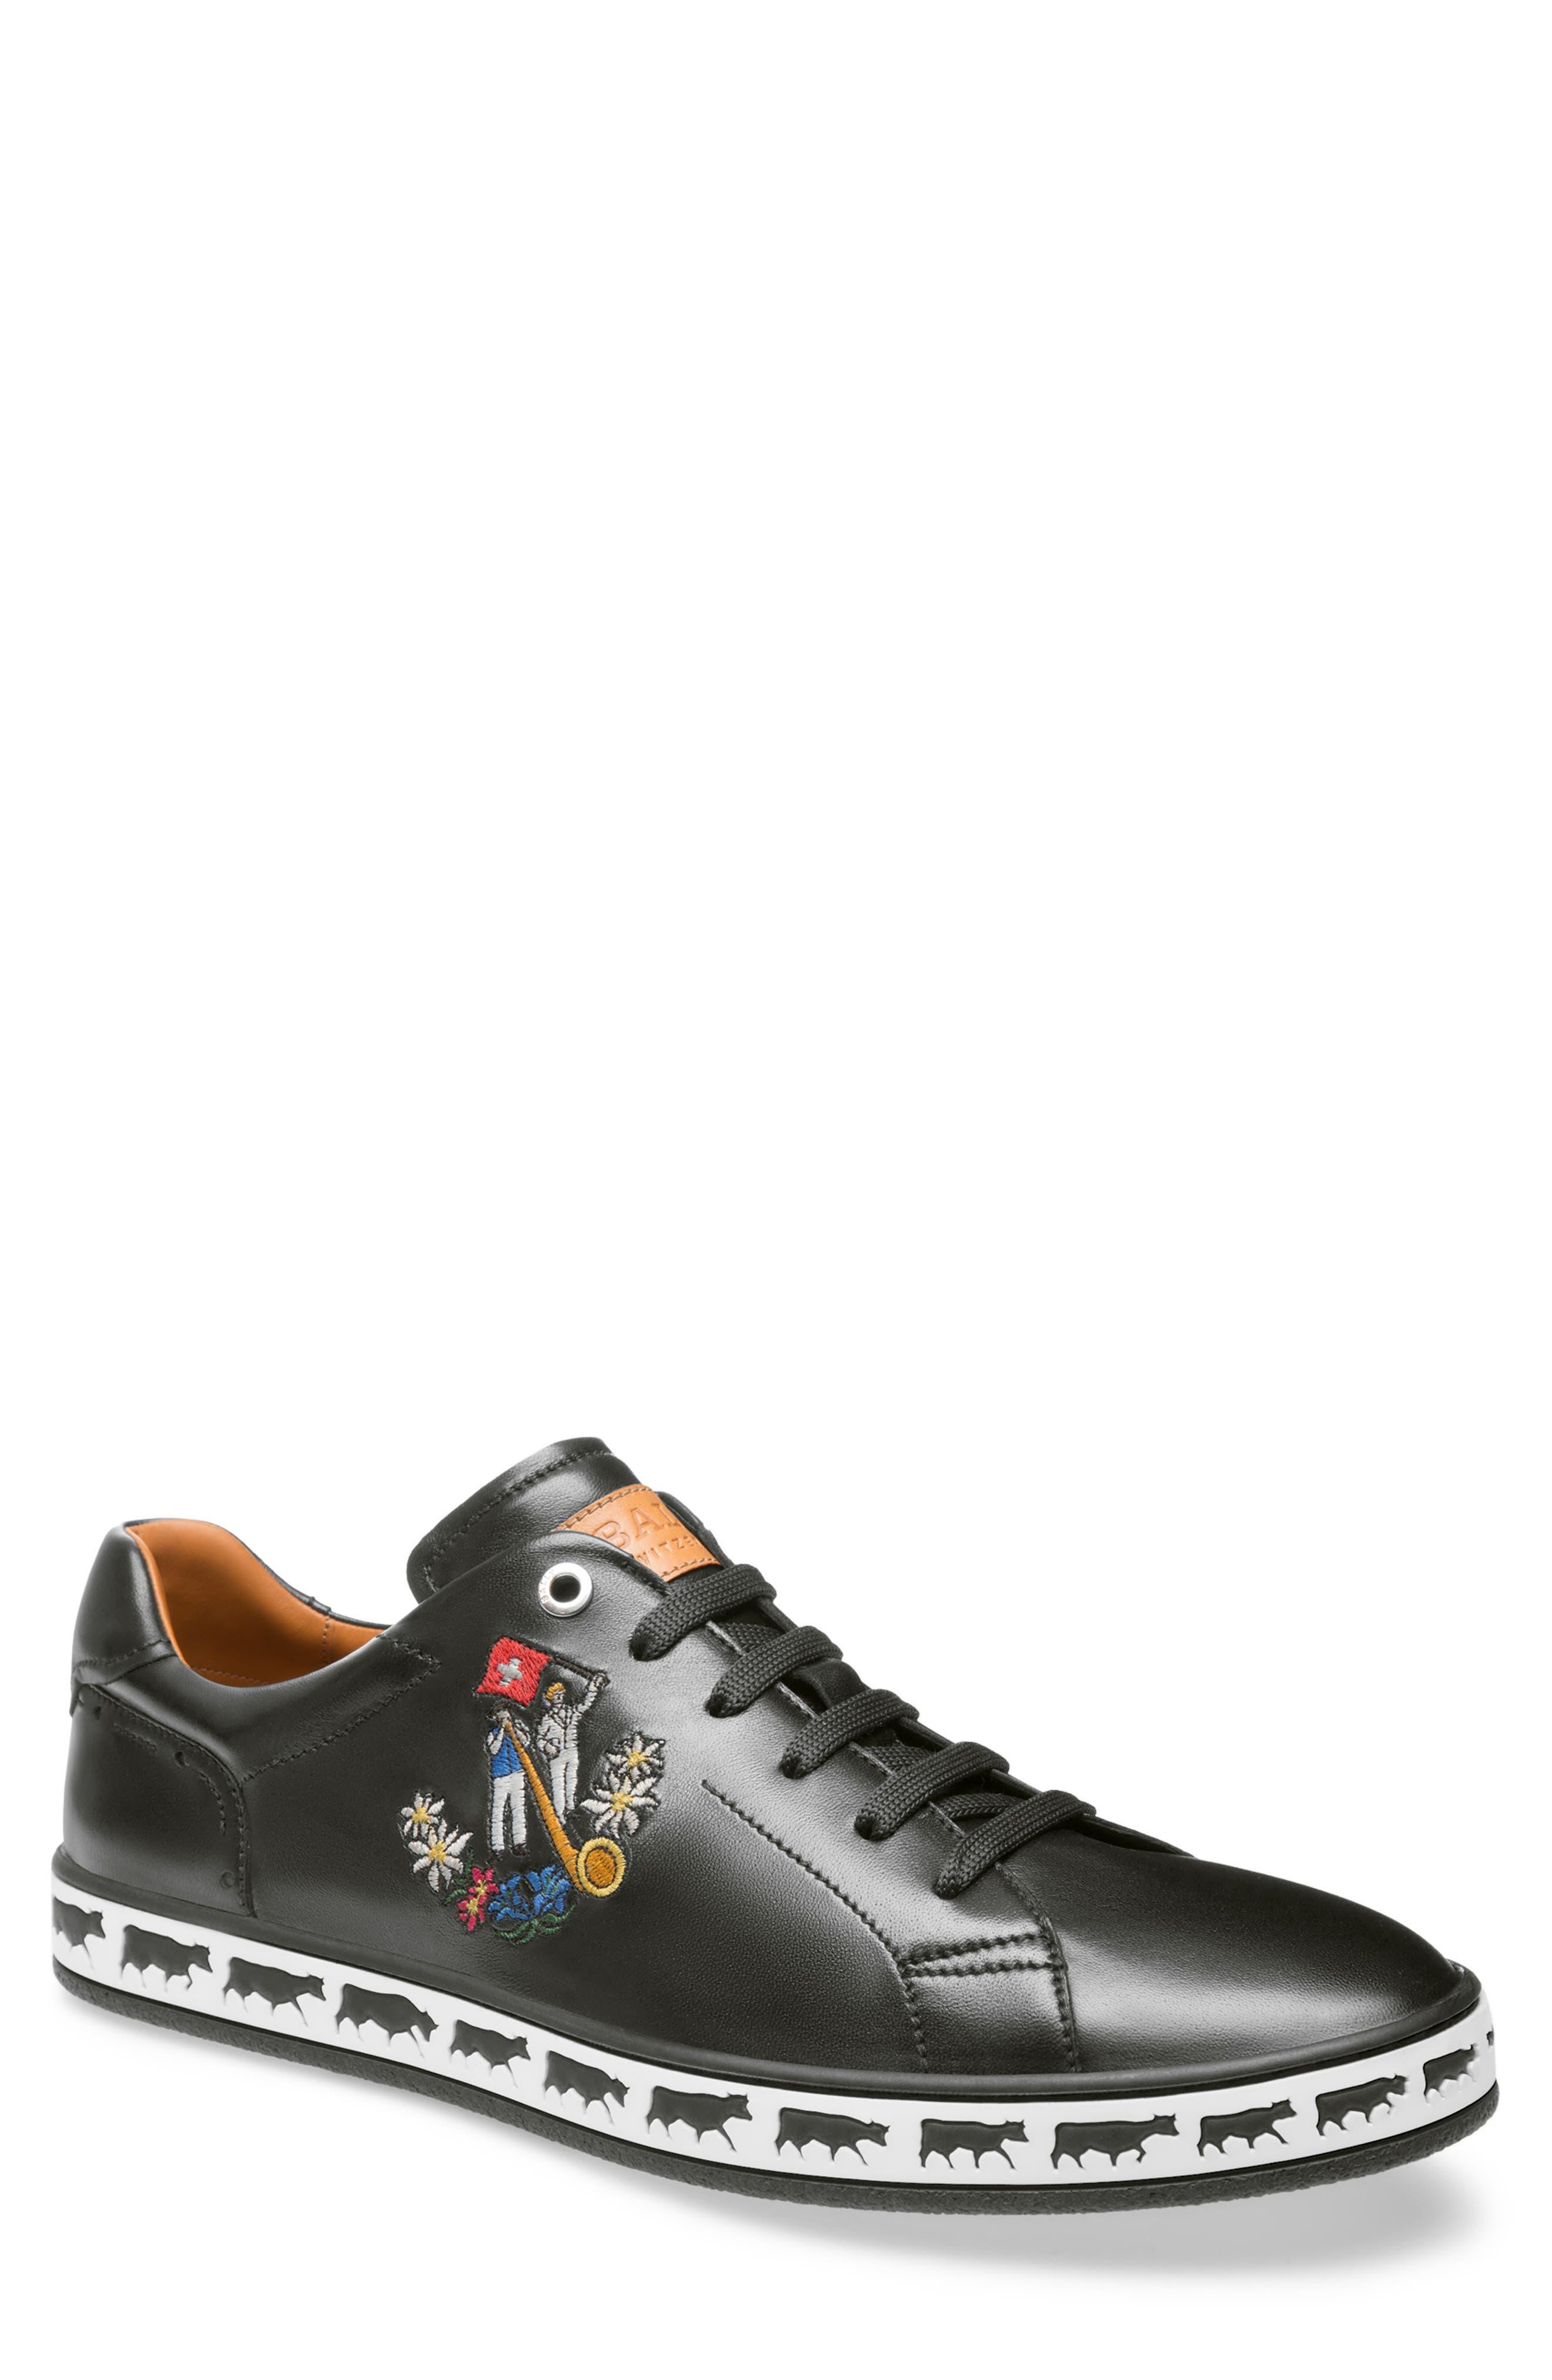 Anistern Sneaker,                             Main thumbnail 1, color,                             BLACK